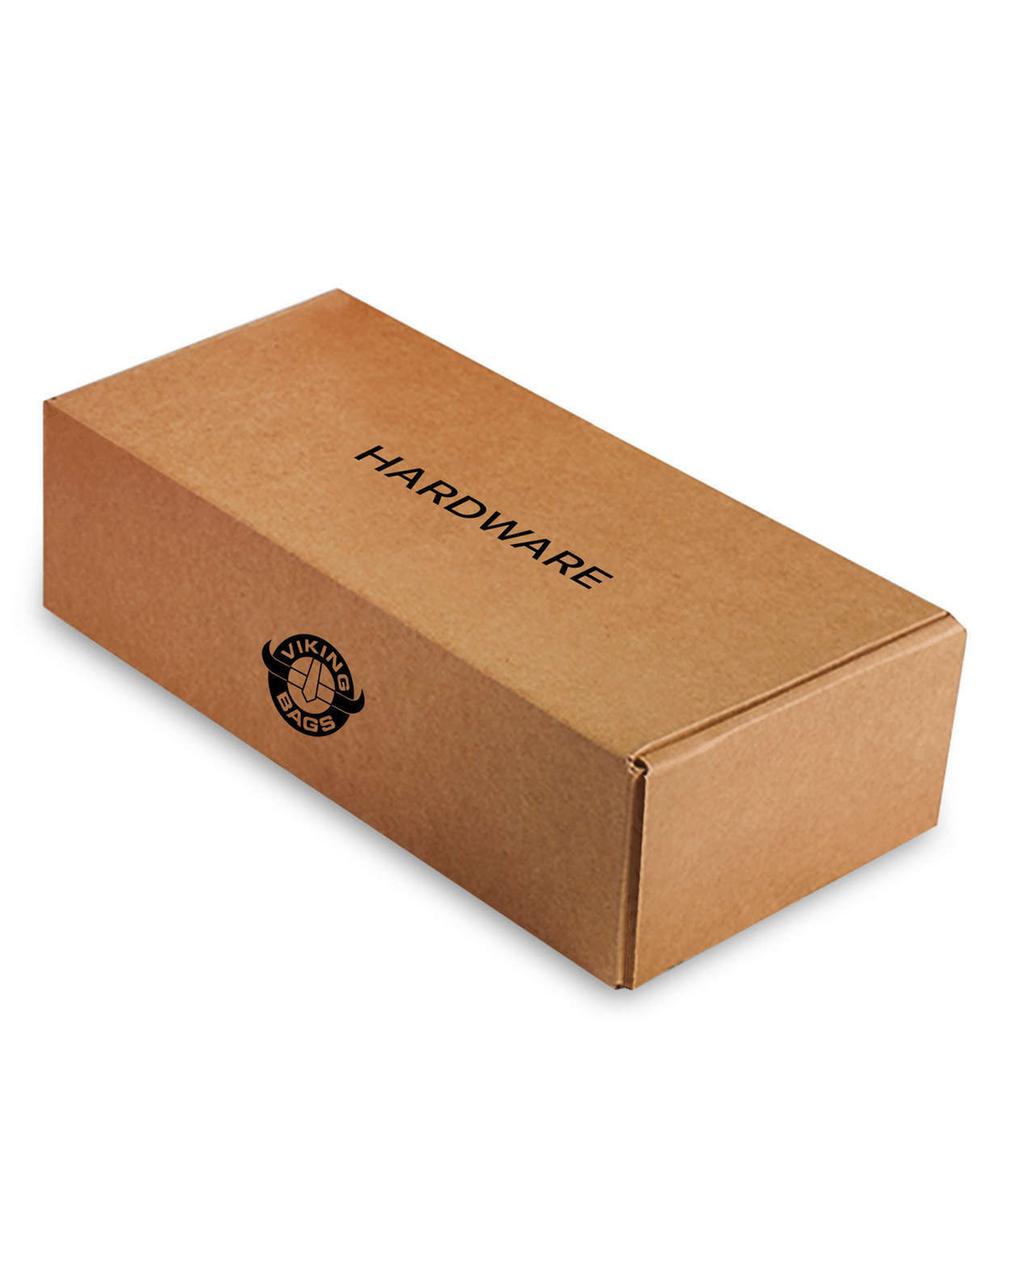 Honda VTX 1800 N Warrior Motorcycle Saddlebags Box